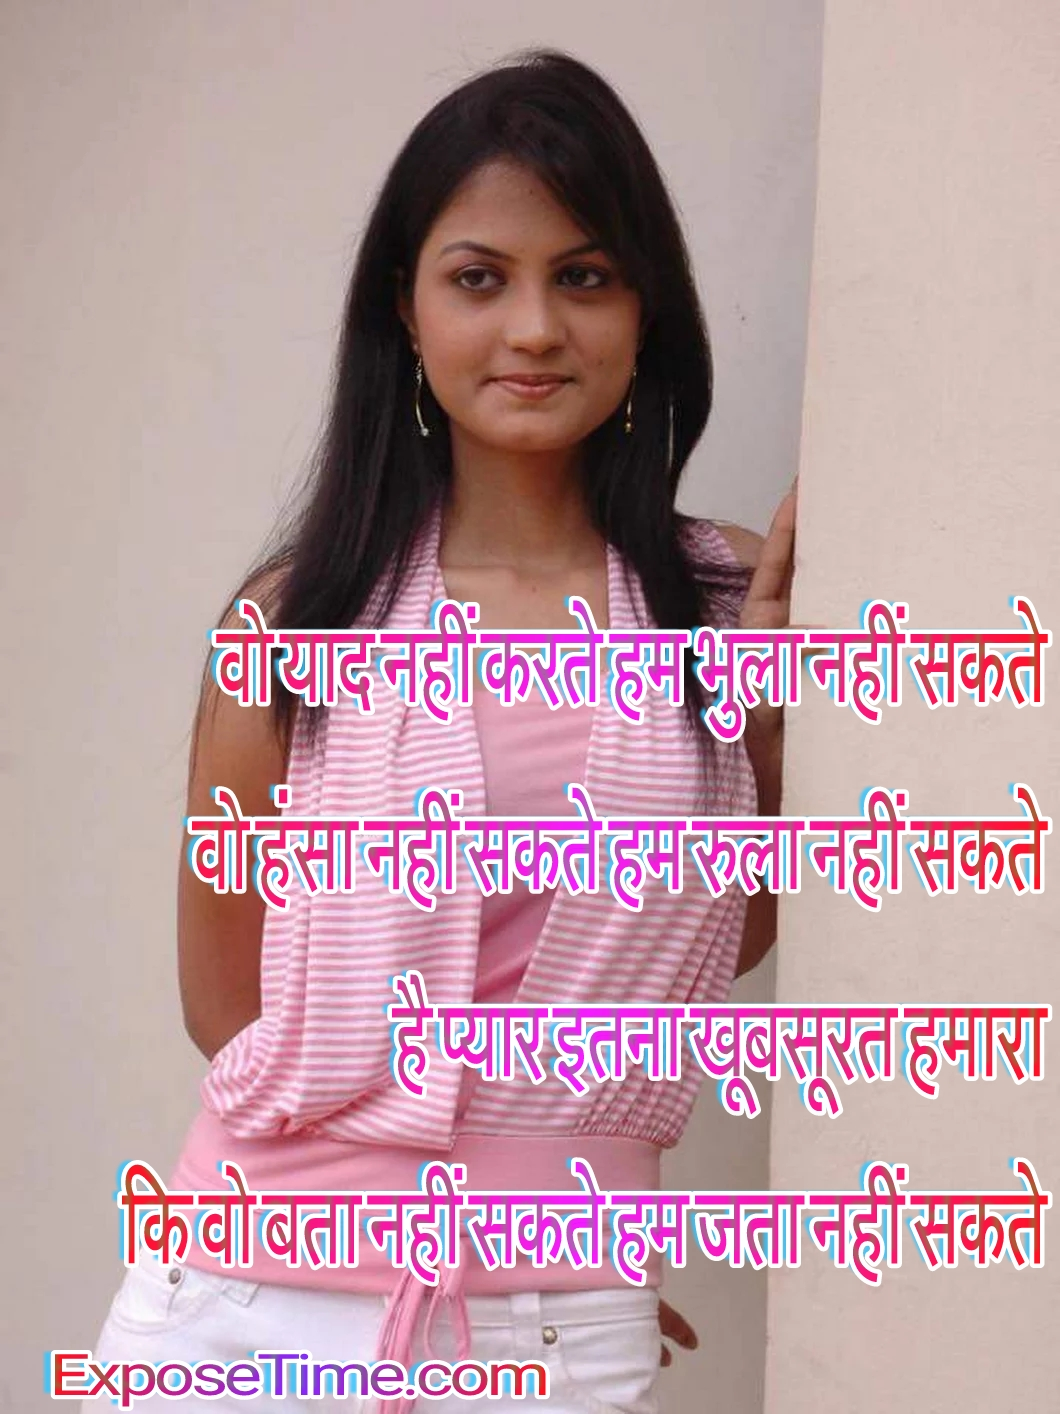 Hindi urdu shayari (Poetry Hindi), सदाबहार शायरी